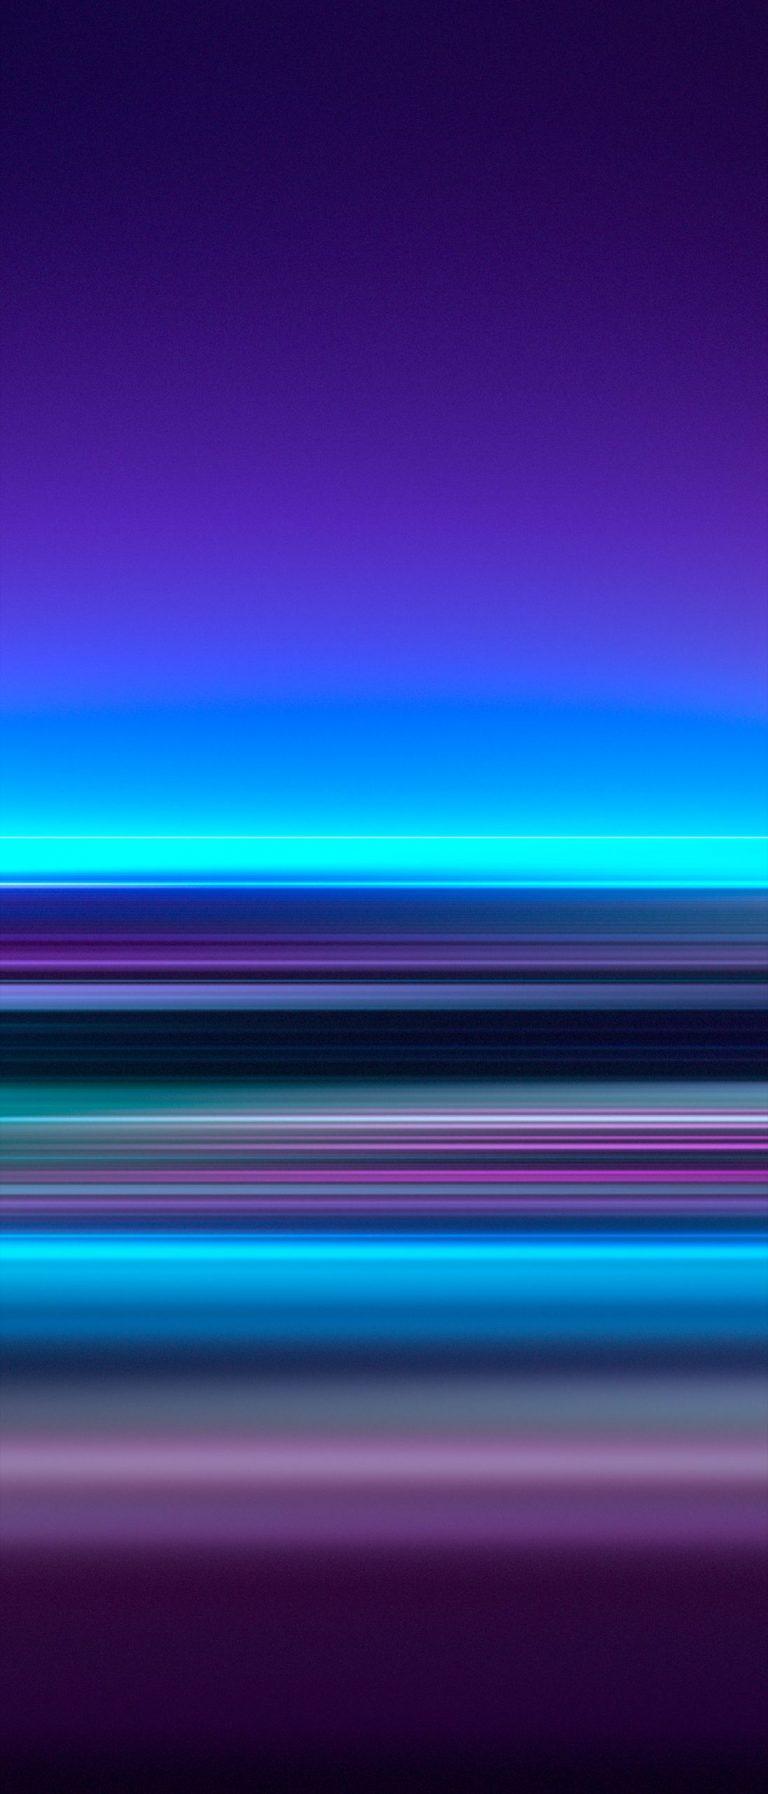 Sony Xperia 1 Stock Wallpaper 02 1096x2560 768x1794